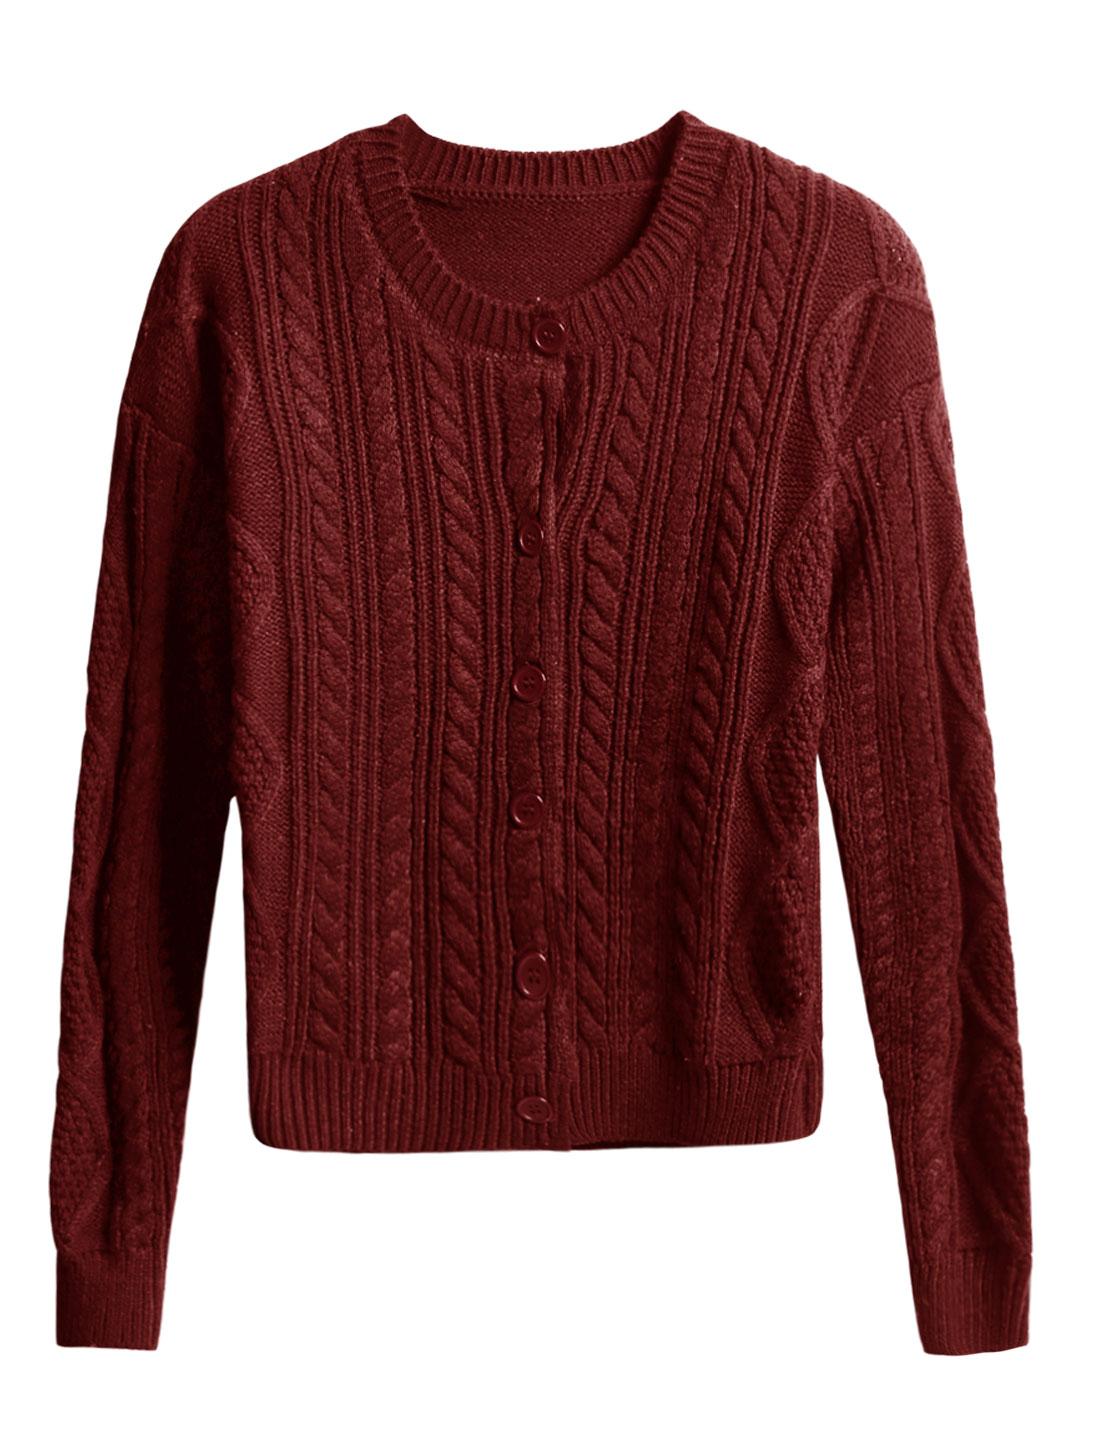 Woman Braided Design Long Sleeves Knitwear Sweater Cardigan Burgundy M